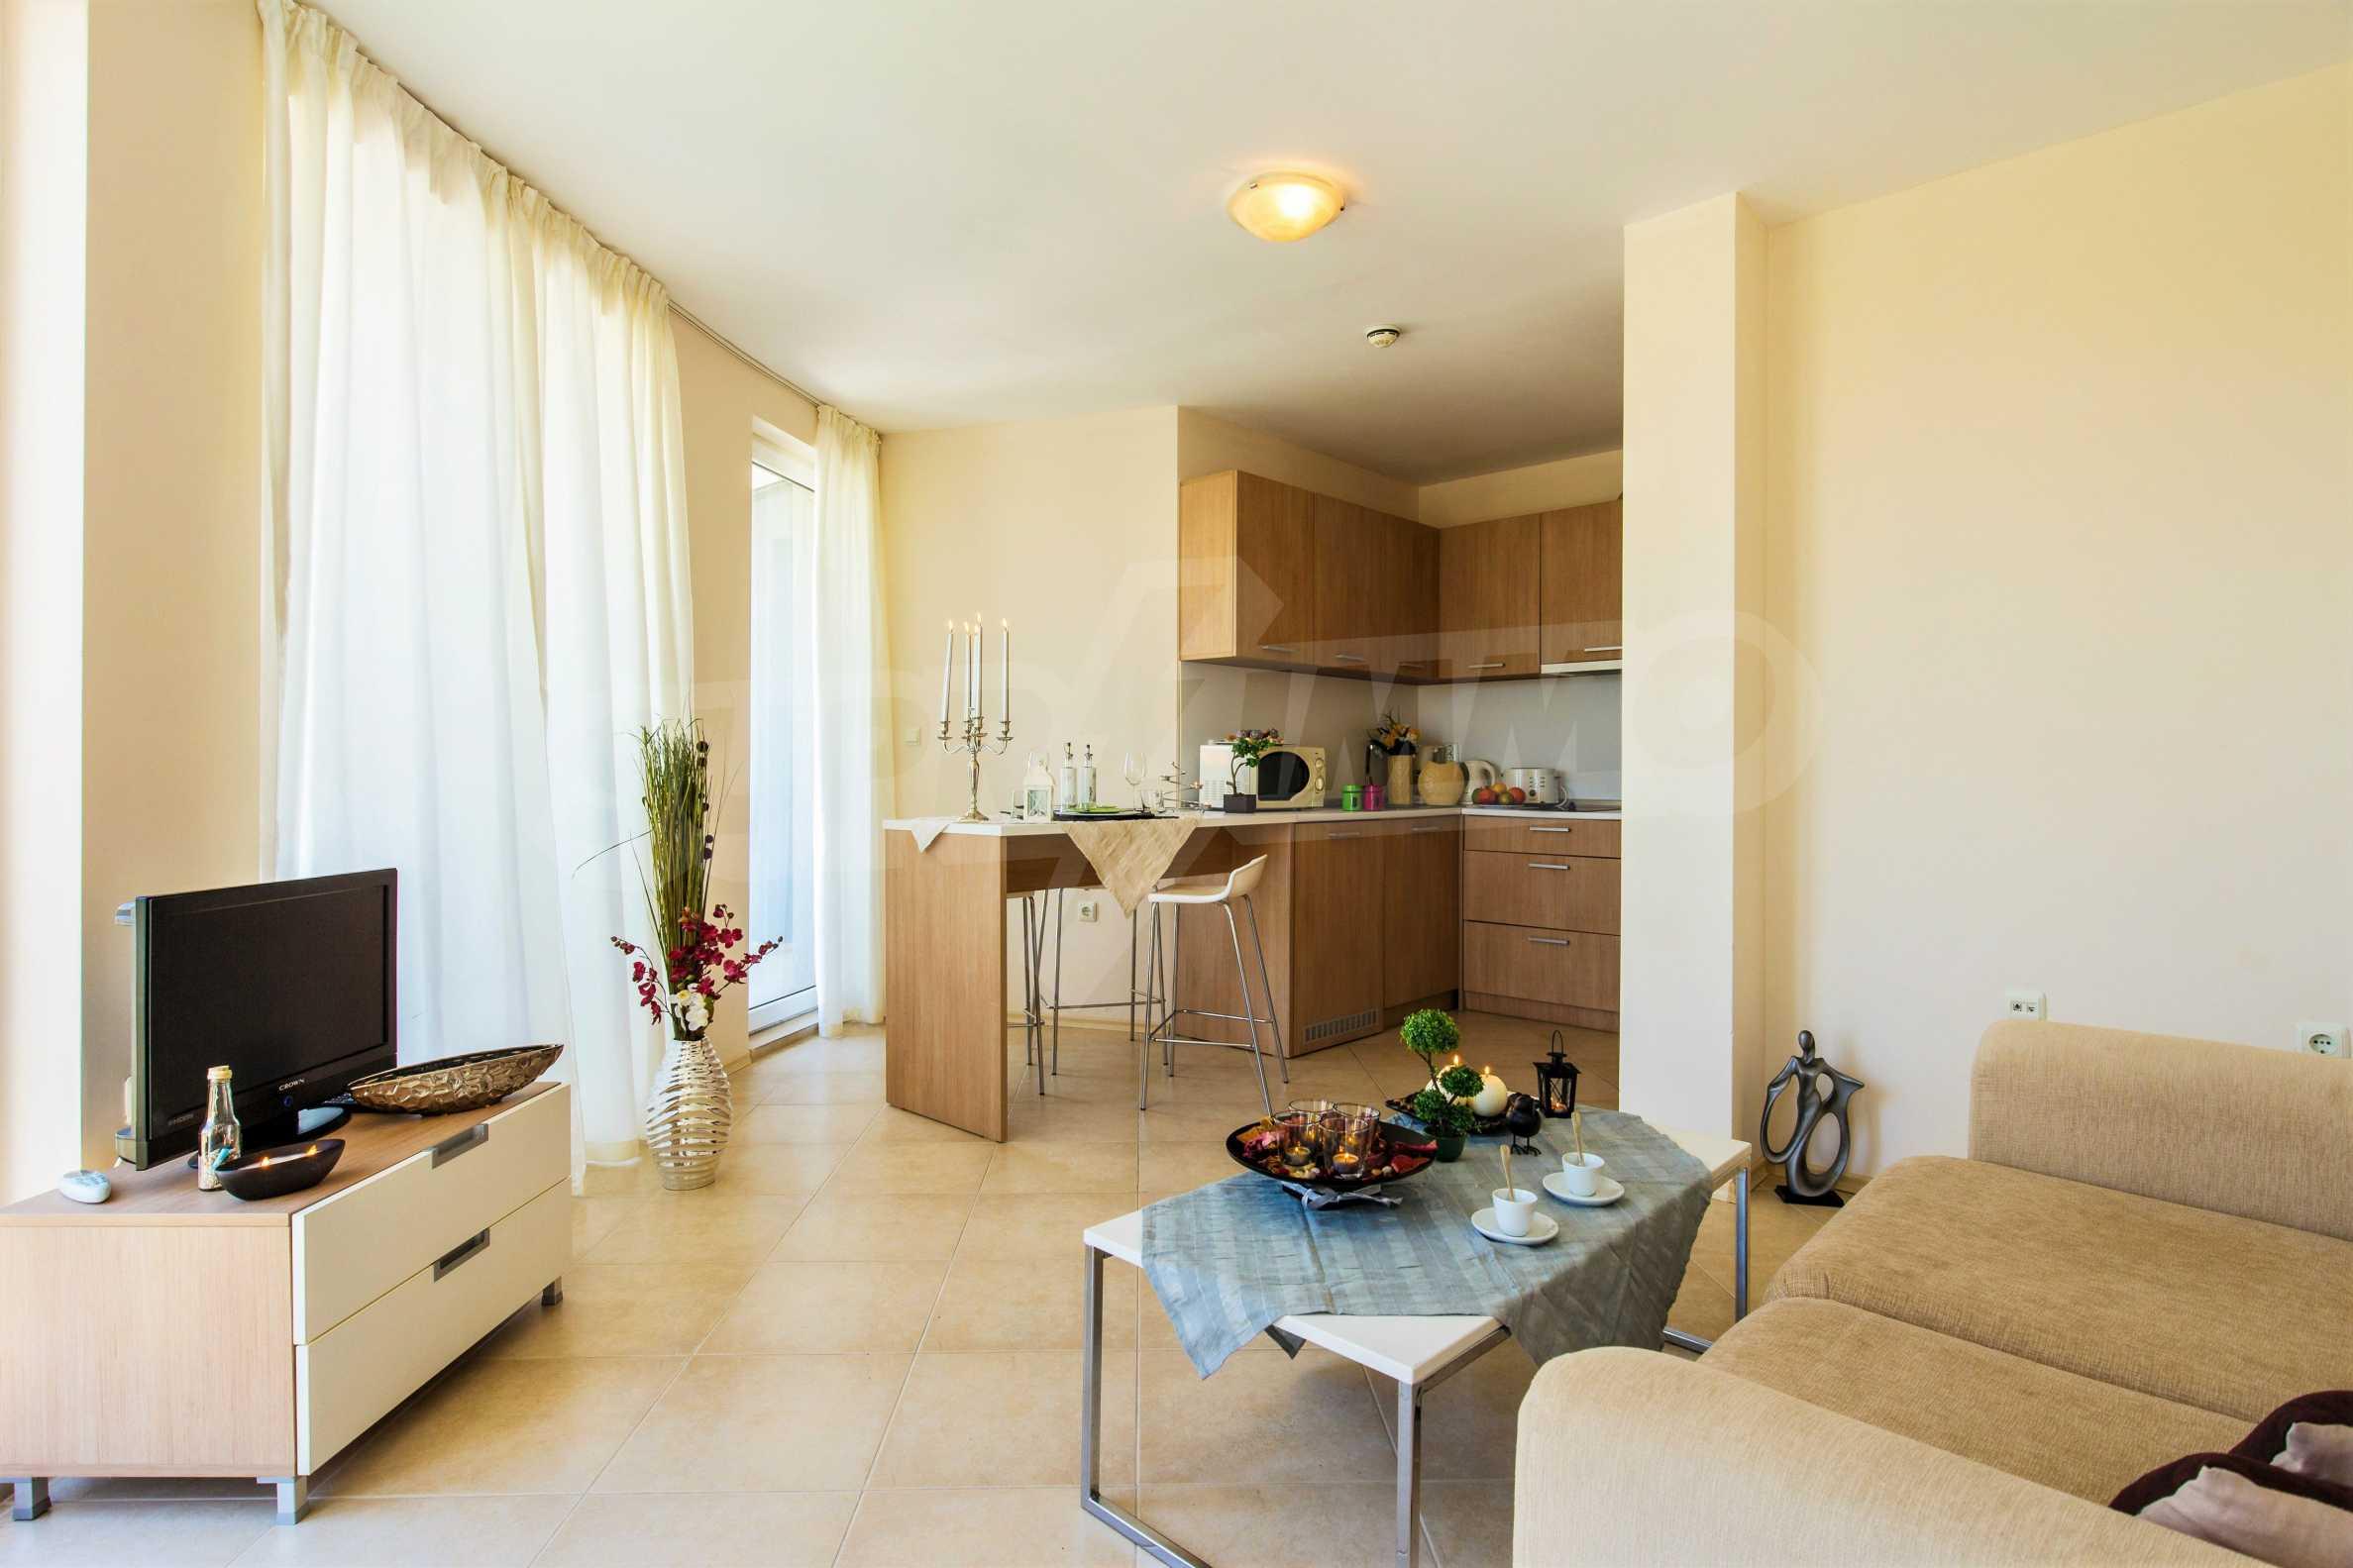 Тристаен апартамент в комплекс Емберли близо до плажа в Лозенец (ап. №423) 1